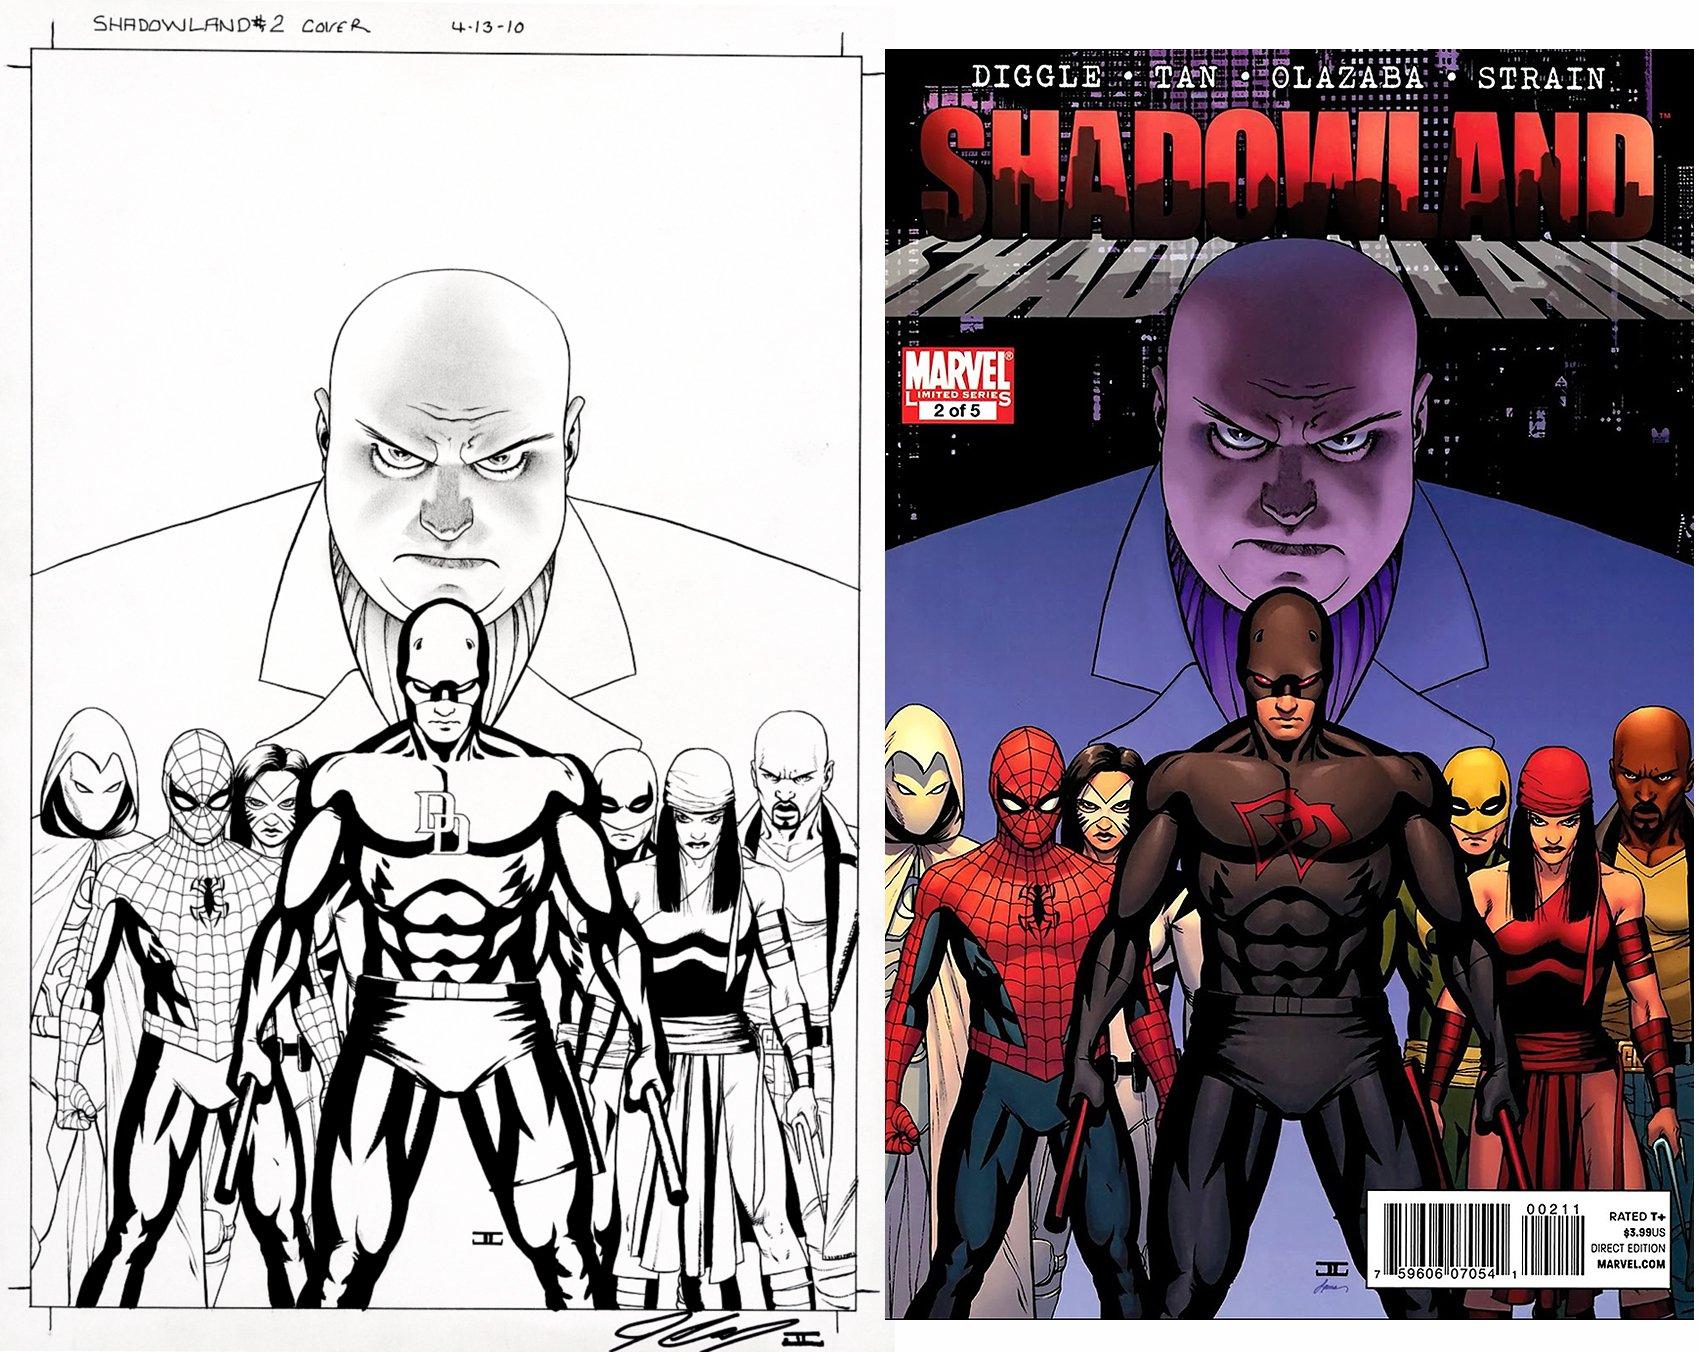 Shadowland #2 Cover (Kingpin, Daredevil, Moon Knight, Spider-Man, White Tiger, Iron Fist, Elektra, Luke Cage!) 2010